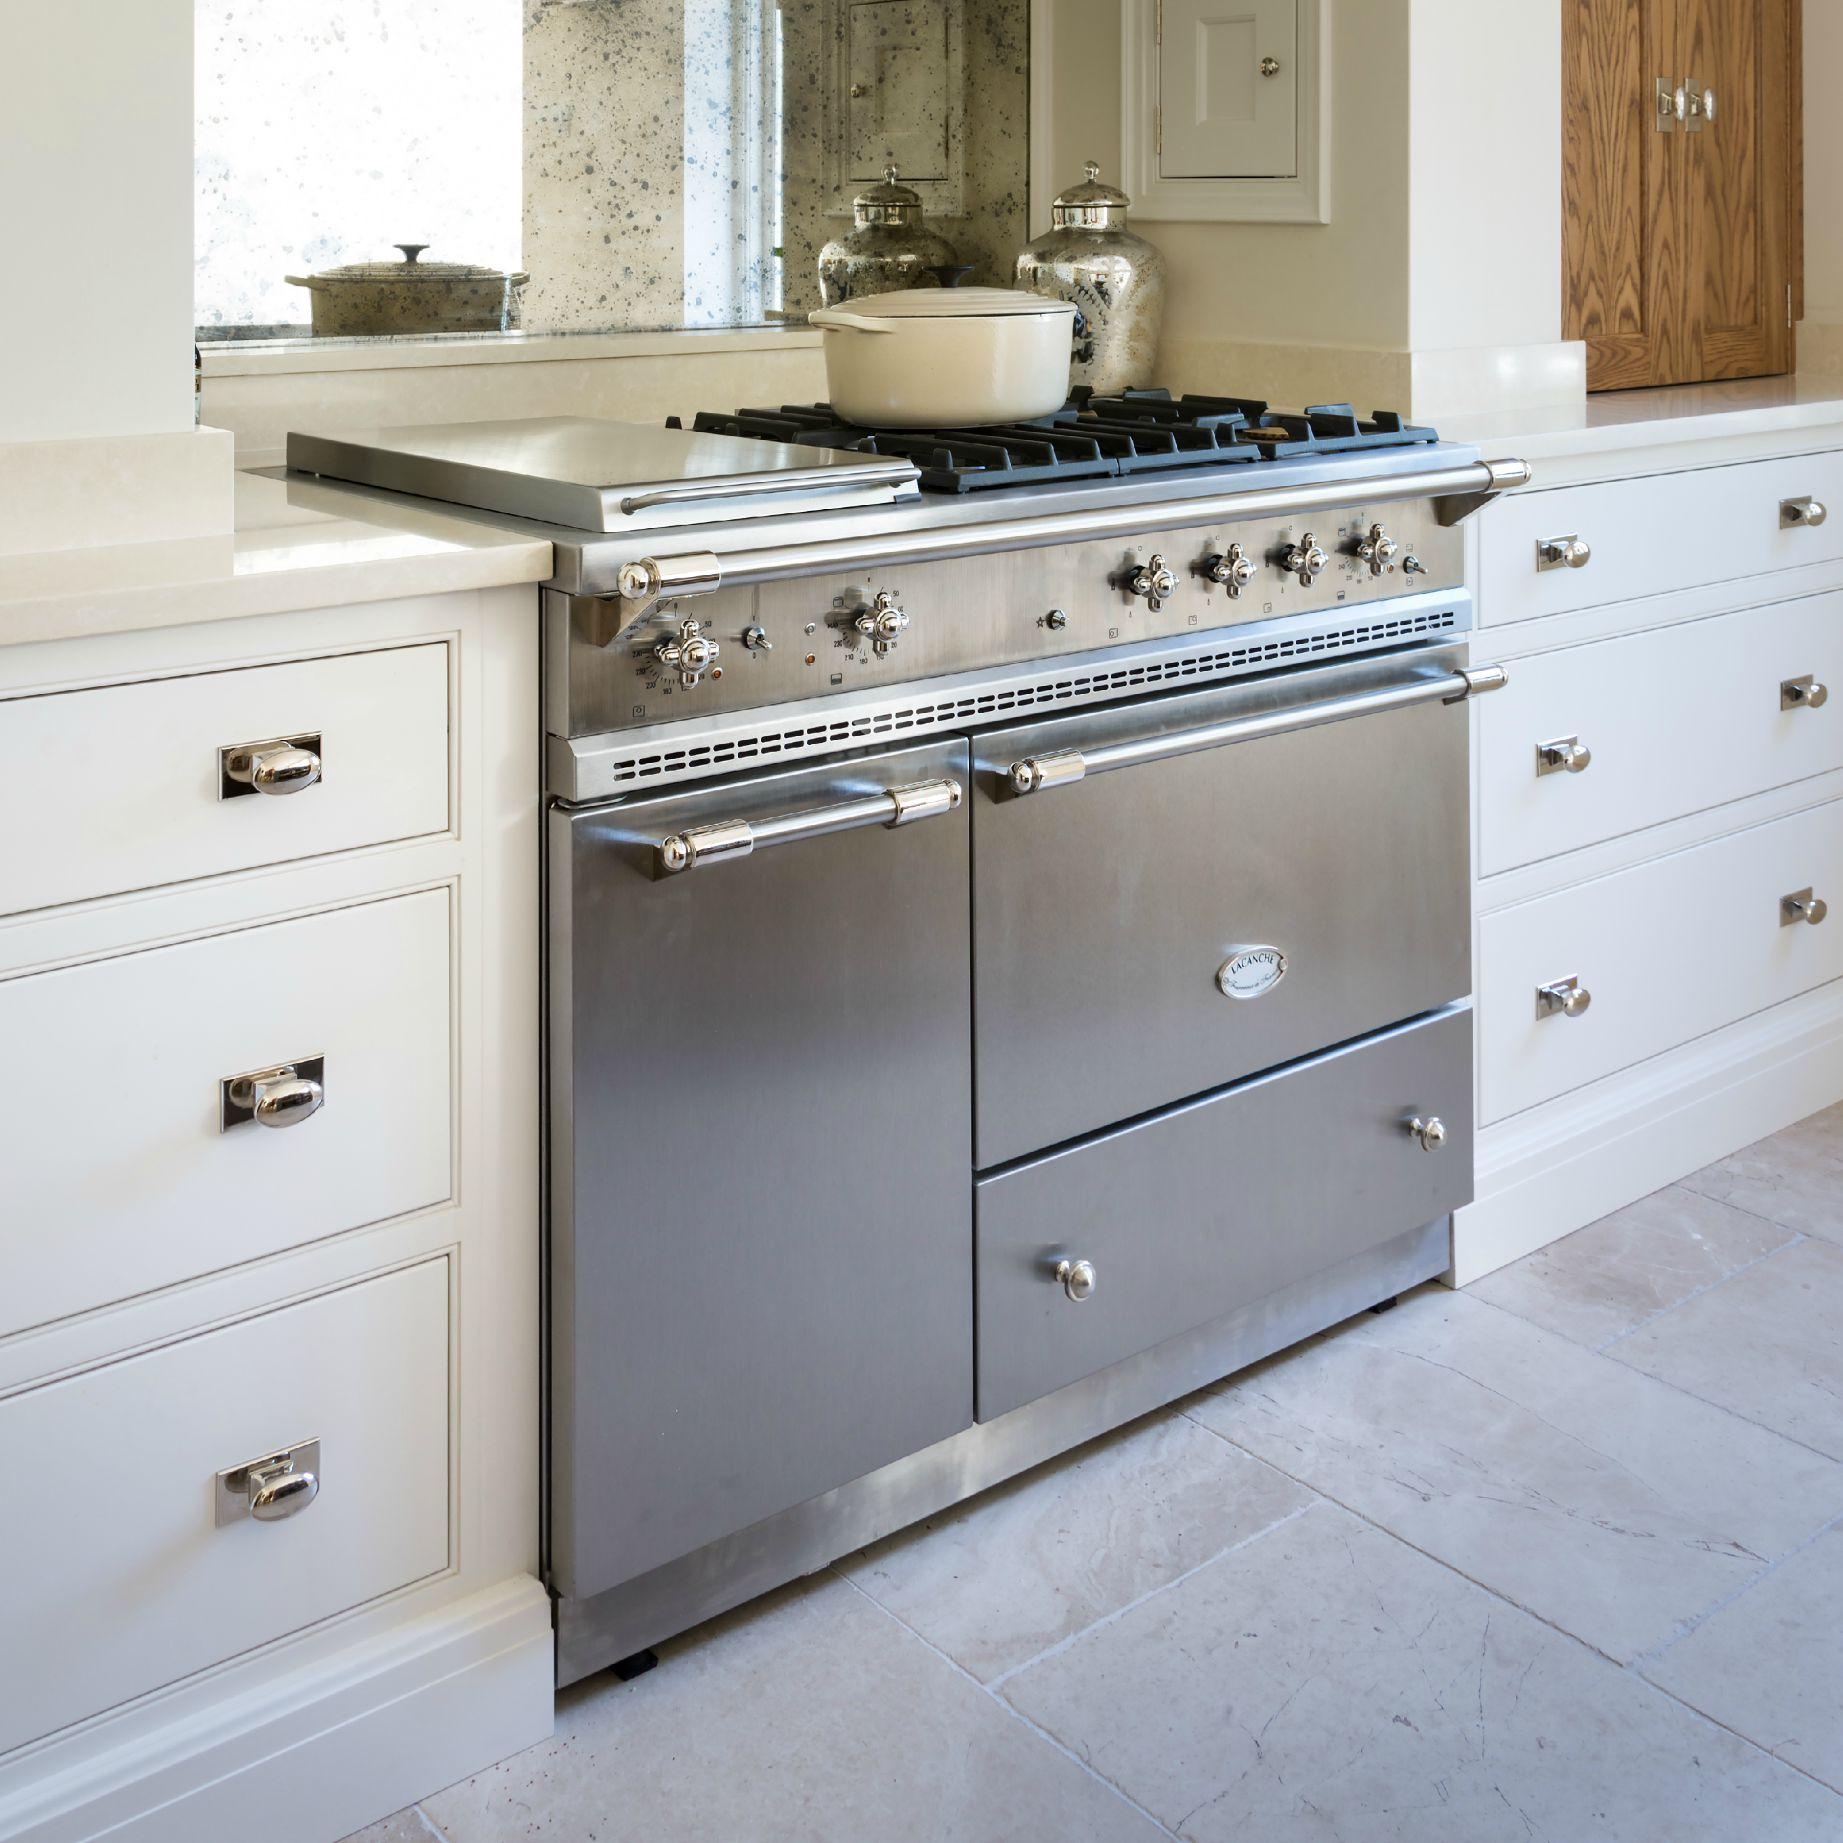 Lacanche Range Cookers - Humphrey Munson